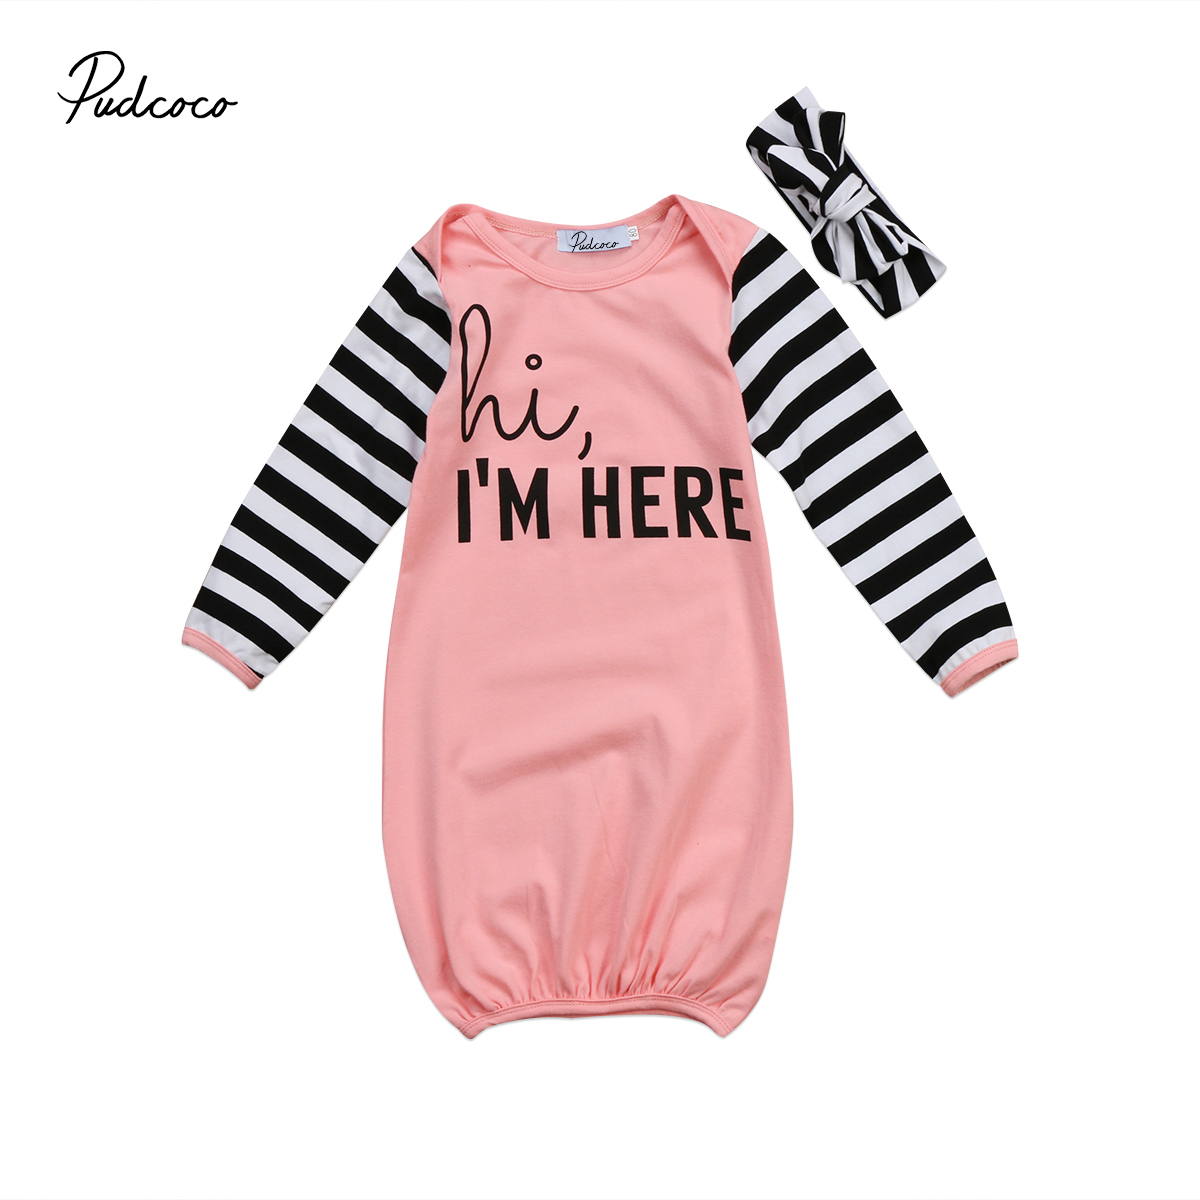 Cute Newborn Infant font b Baby b font Girl Outfits Pink Stripe Sleeve sleeping Bags Sleepsacks